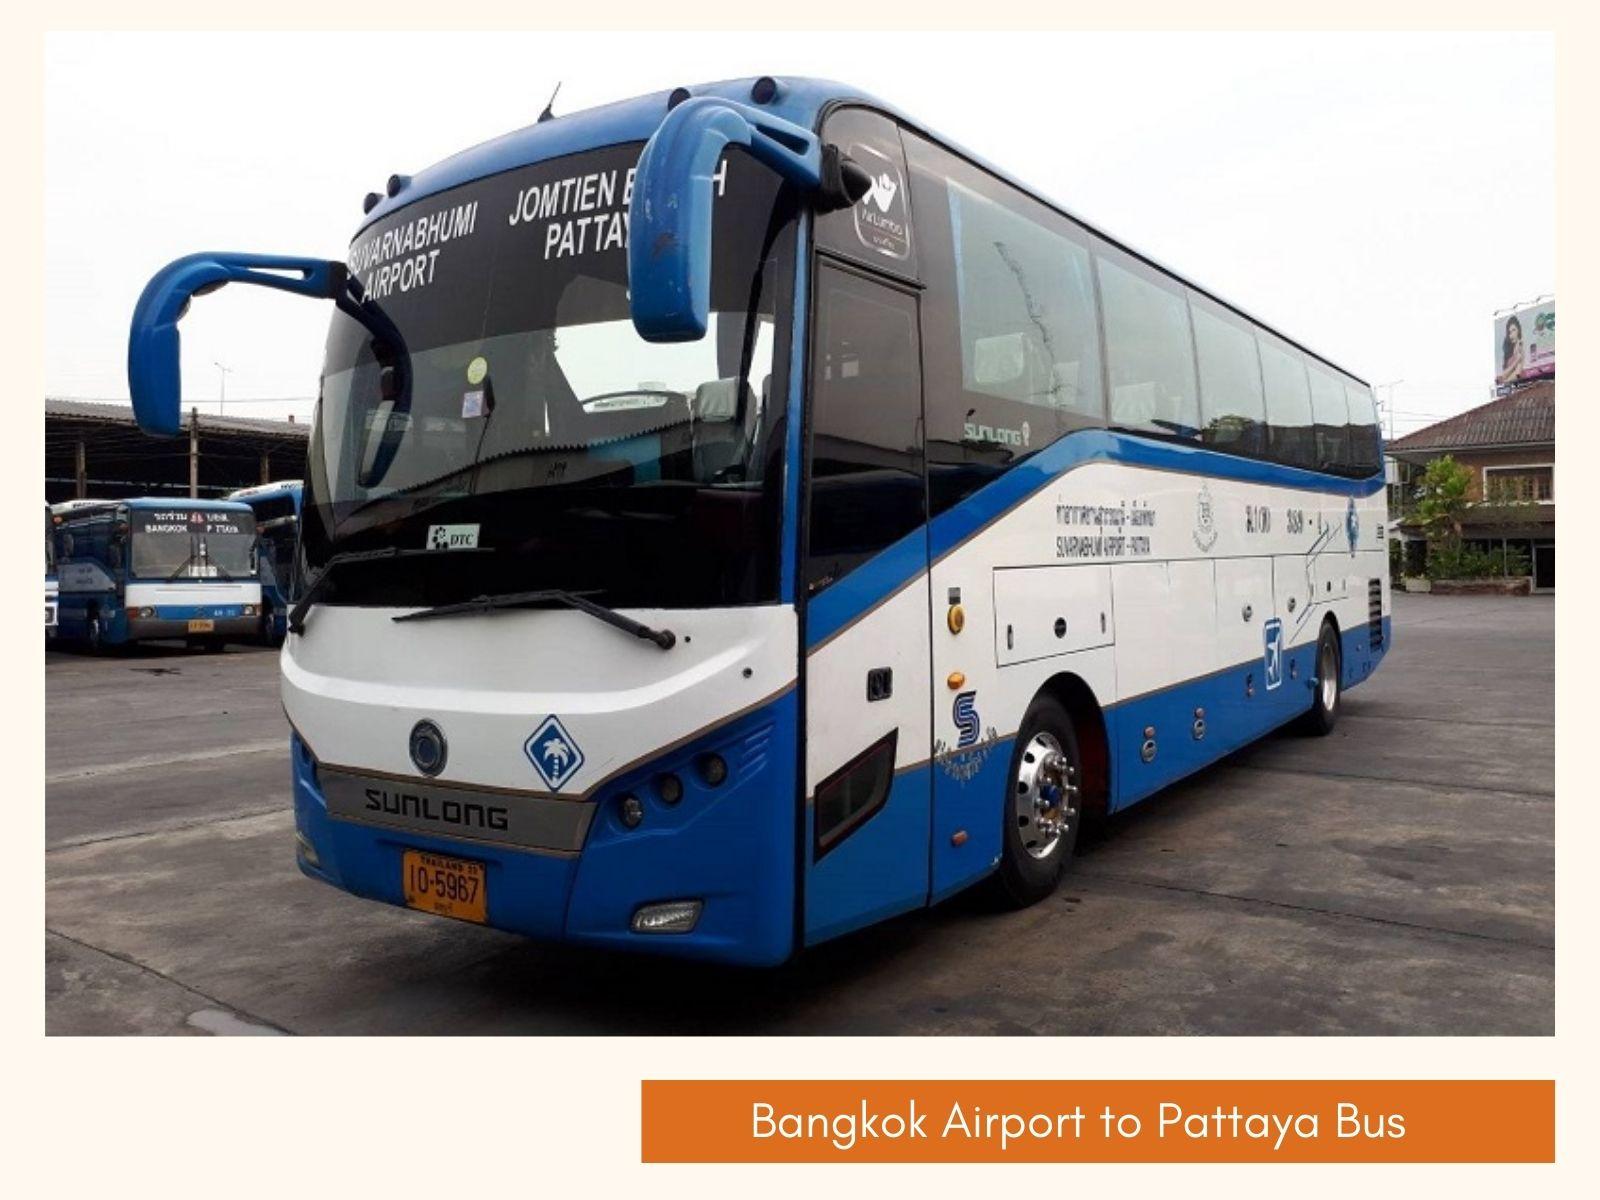 Best way to travel from Bangkok Airport to Pattaya